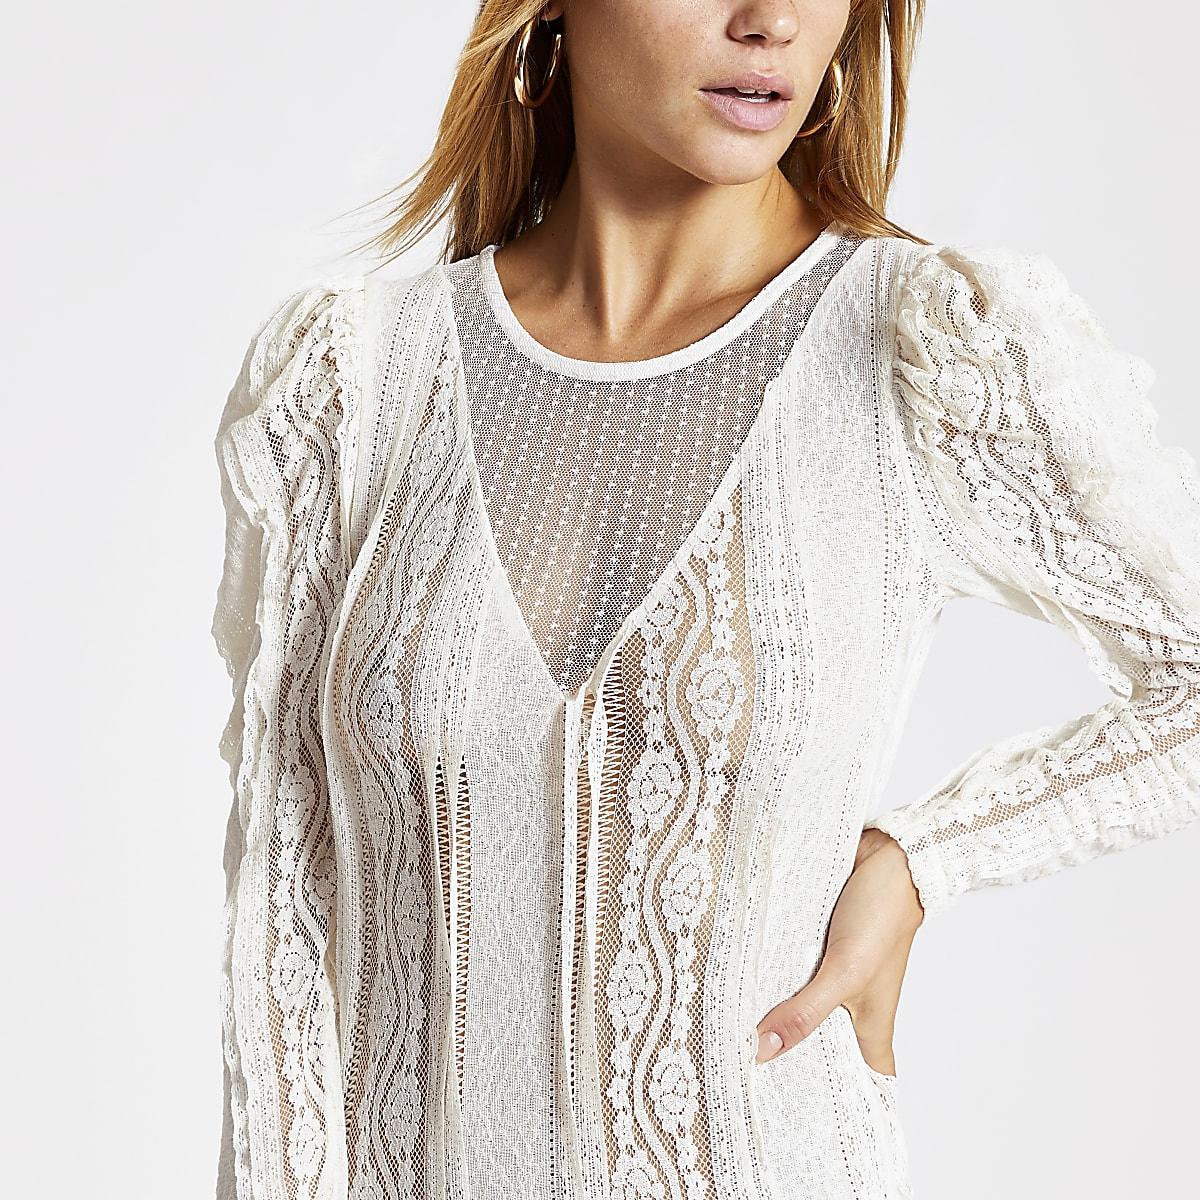 Cream sheer lace long sleeve bodysuit